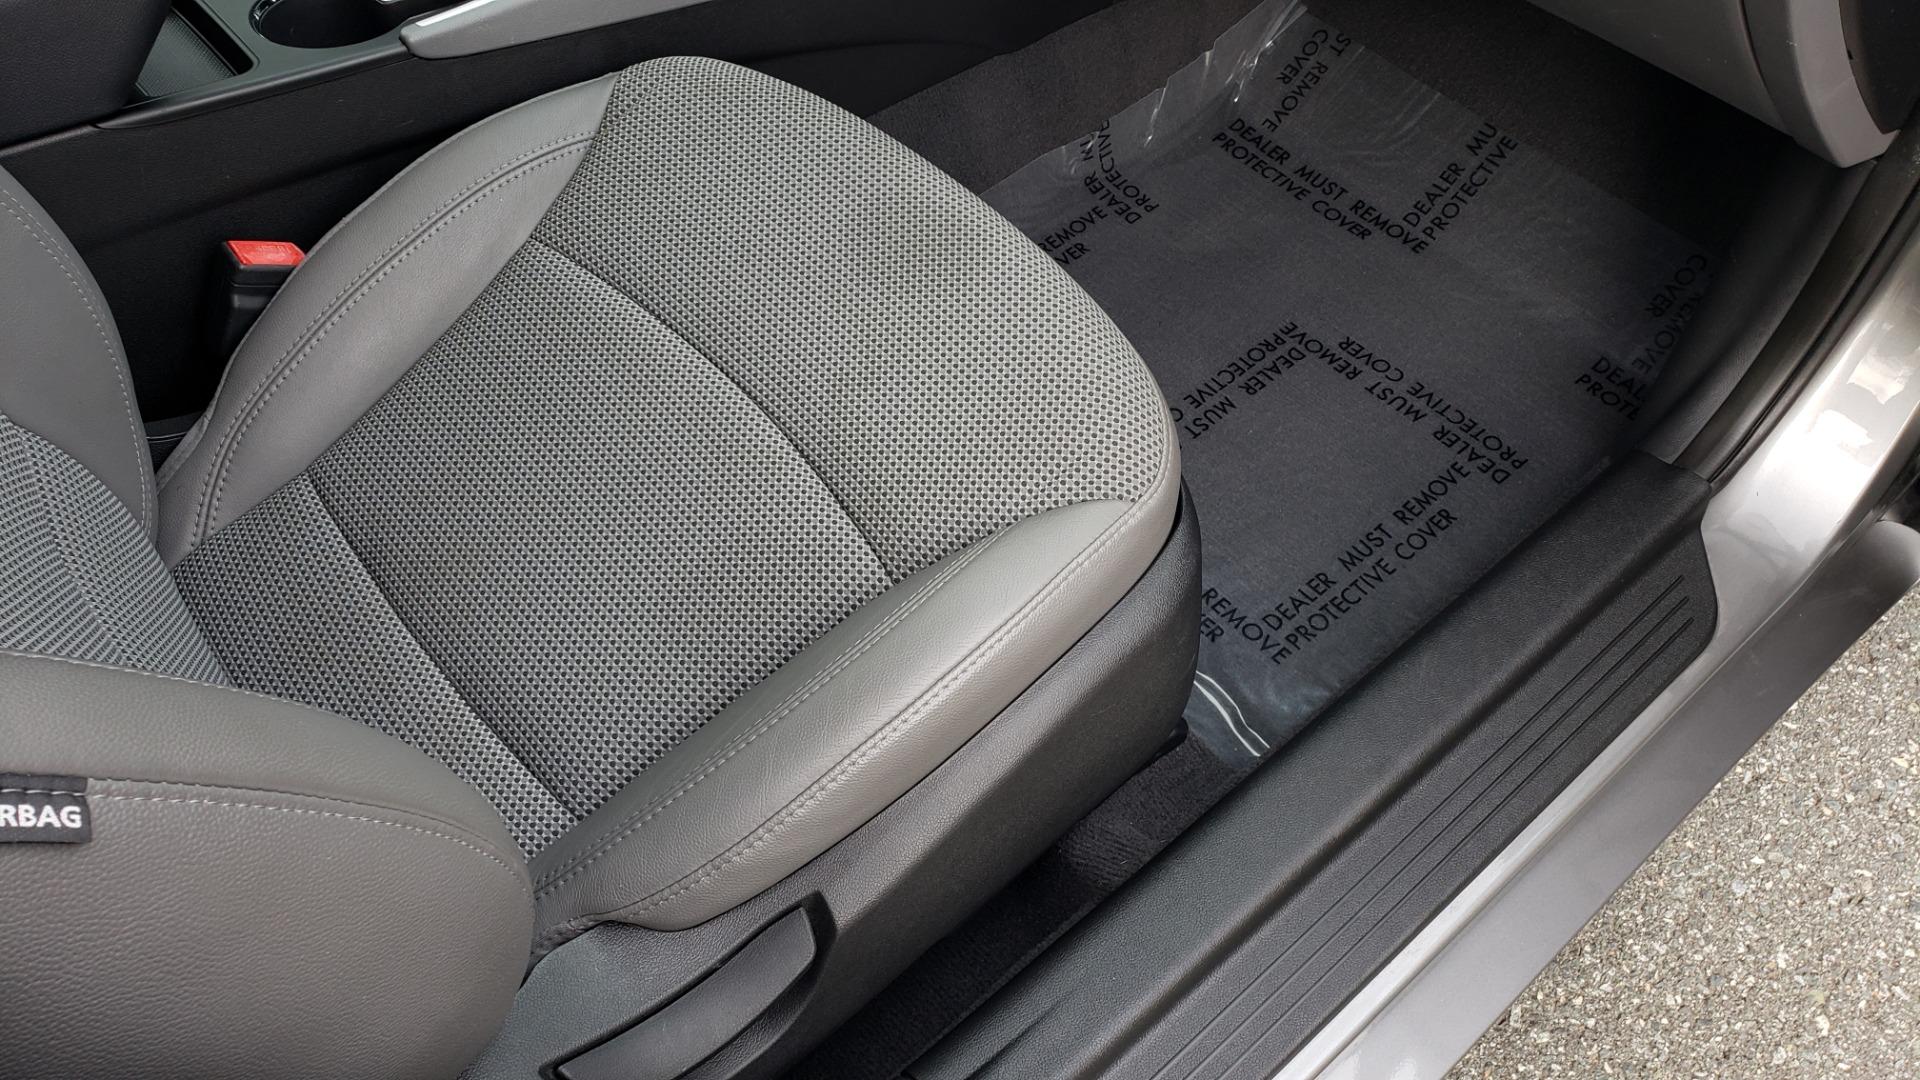 Used 2013 Hyundai SONATA SE AUTO / 2.4L 4-CYL / 6-SPD AUTO / VERY CLEAN for sale Sold at Formula Imports in Charlotte NC 28227 62